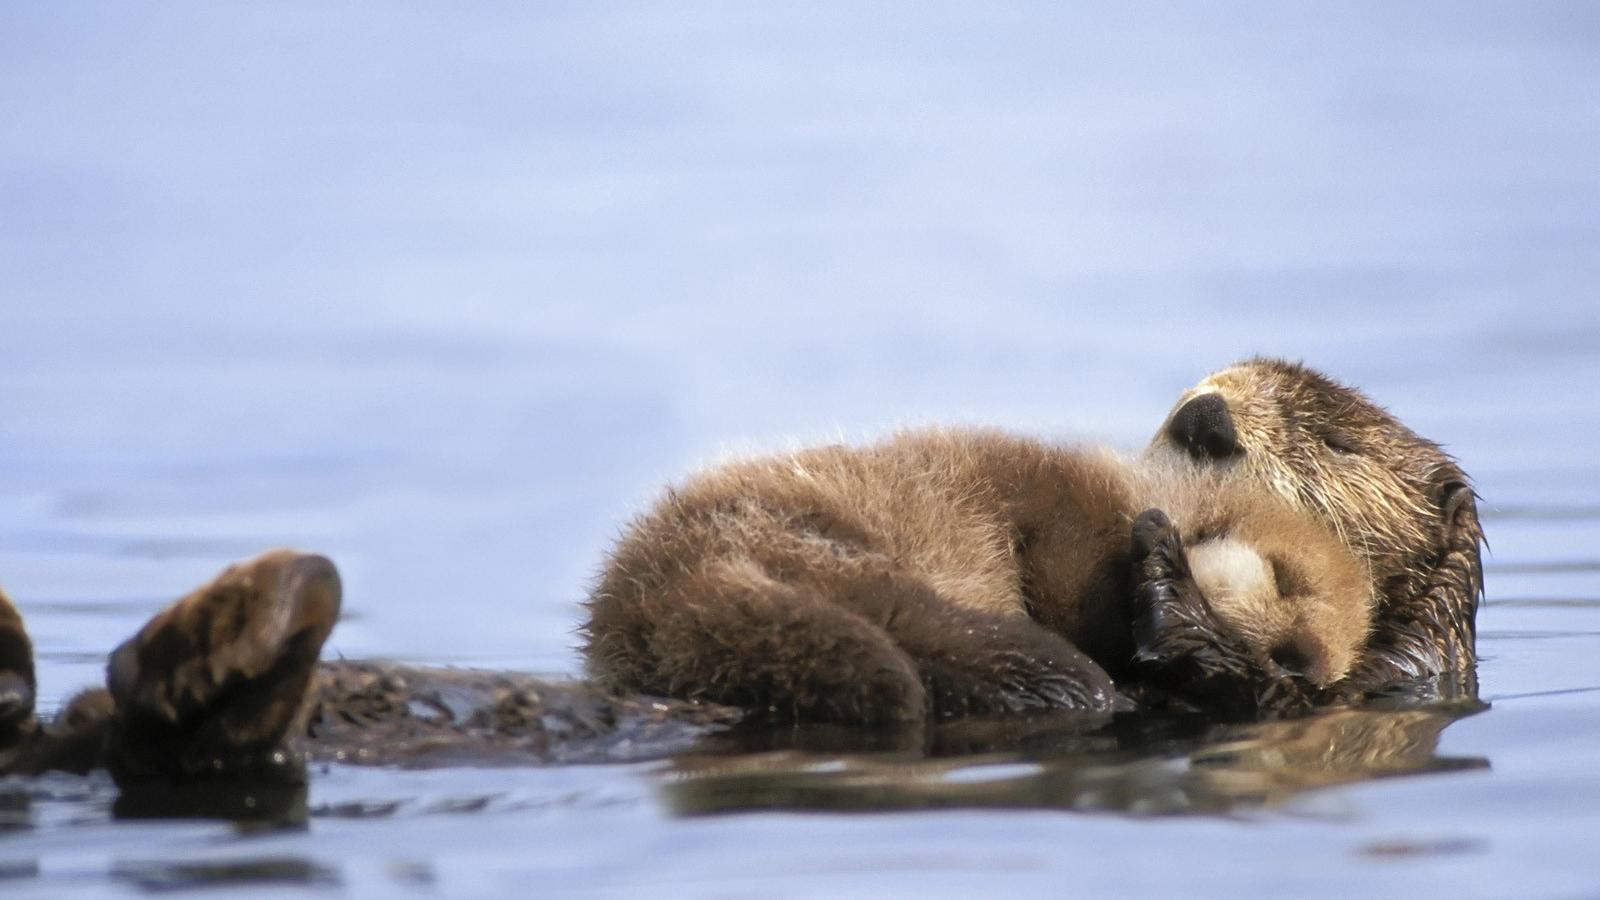 Animals alaska otters gulf baby sea wallpaper 24079 1600x900